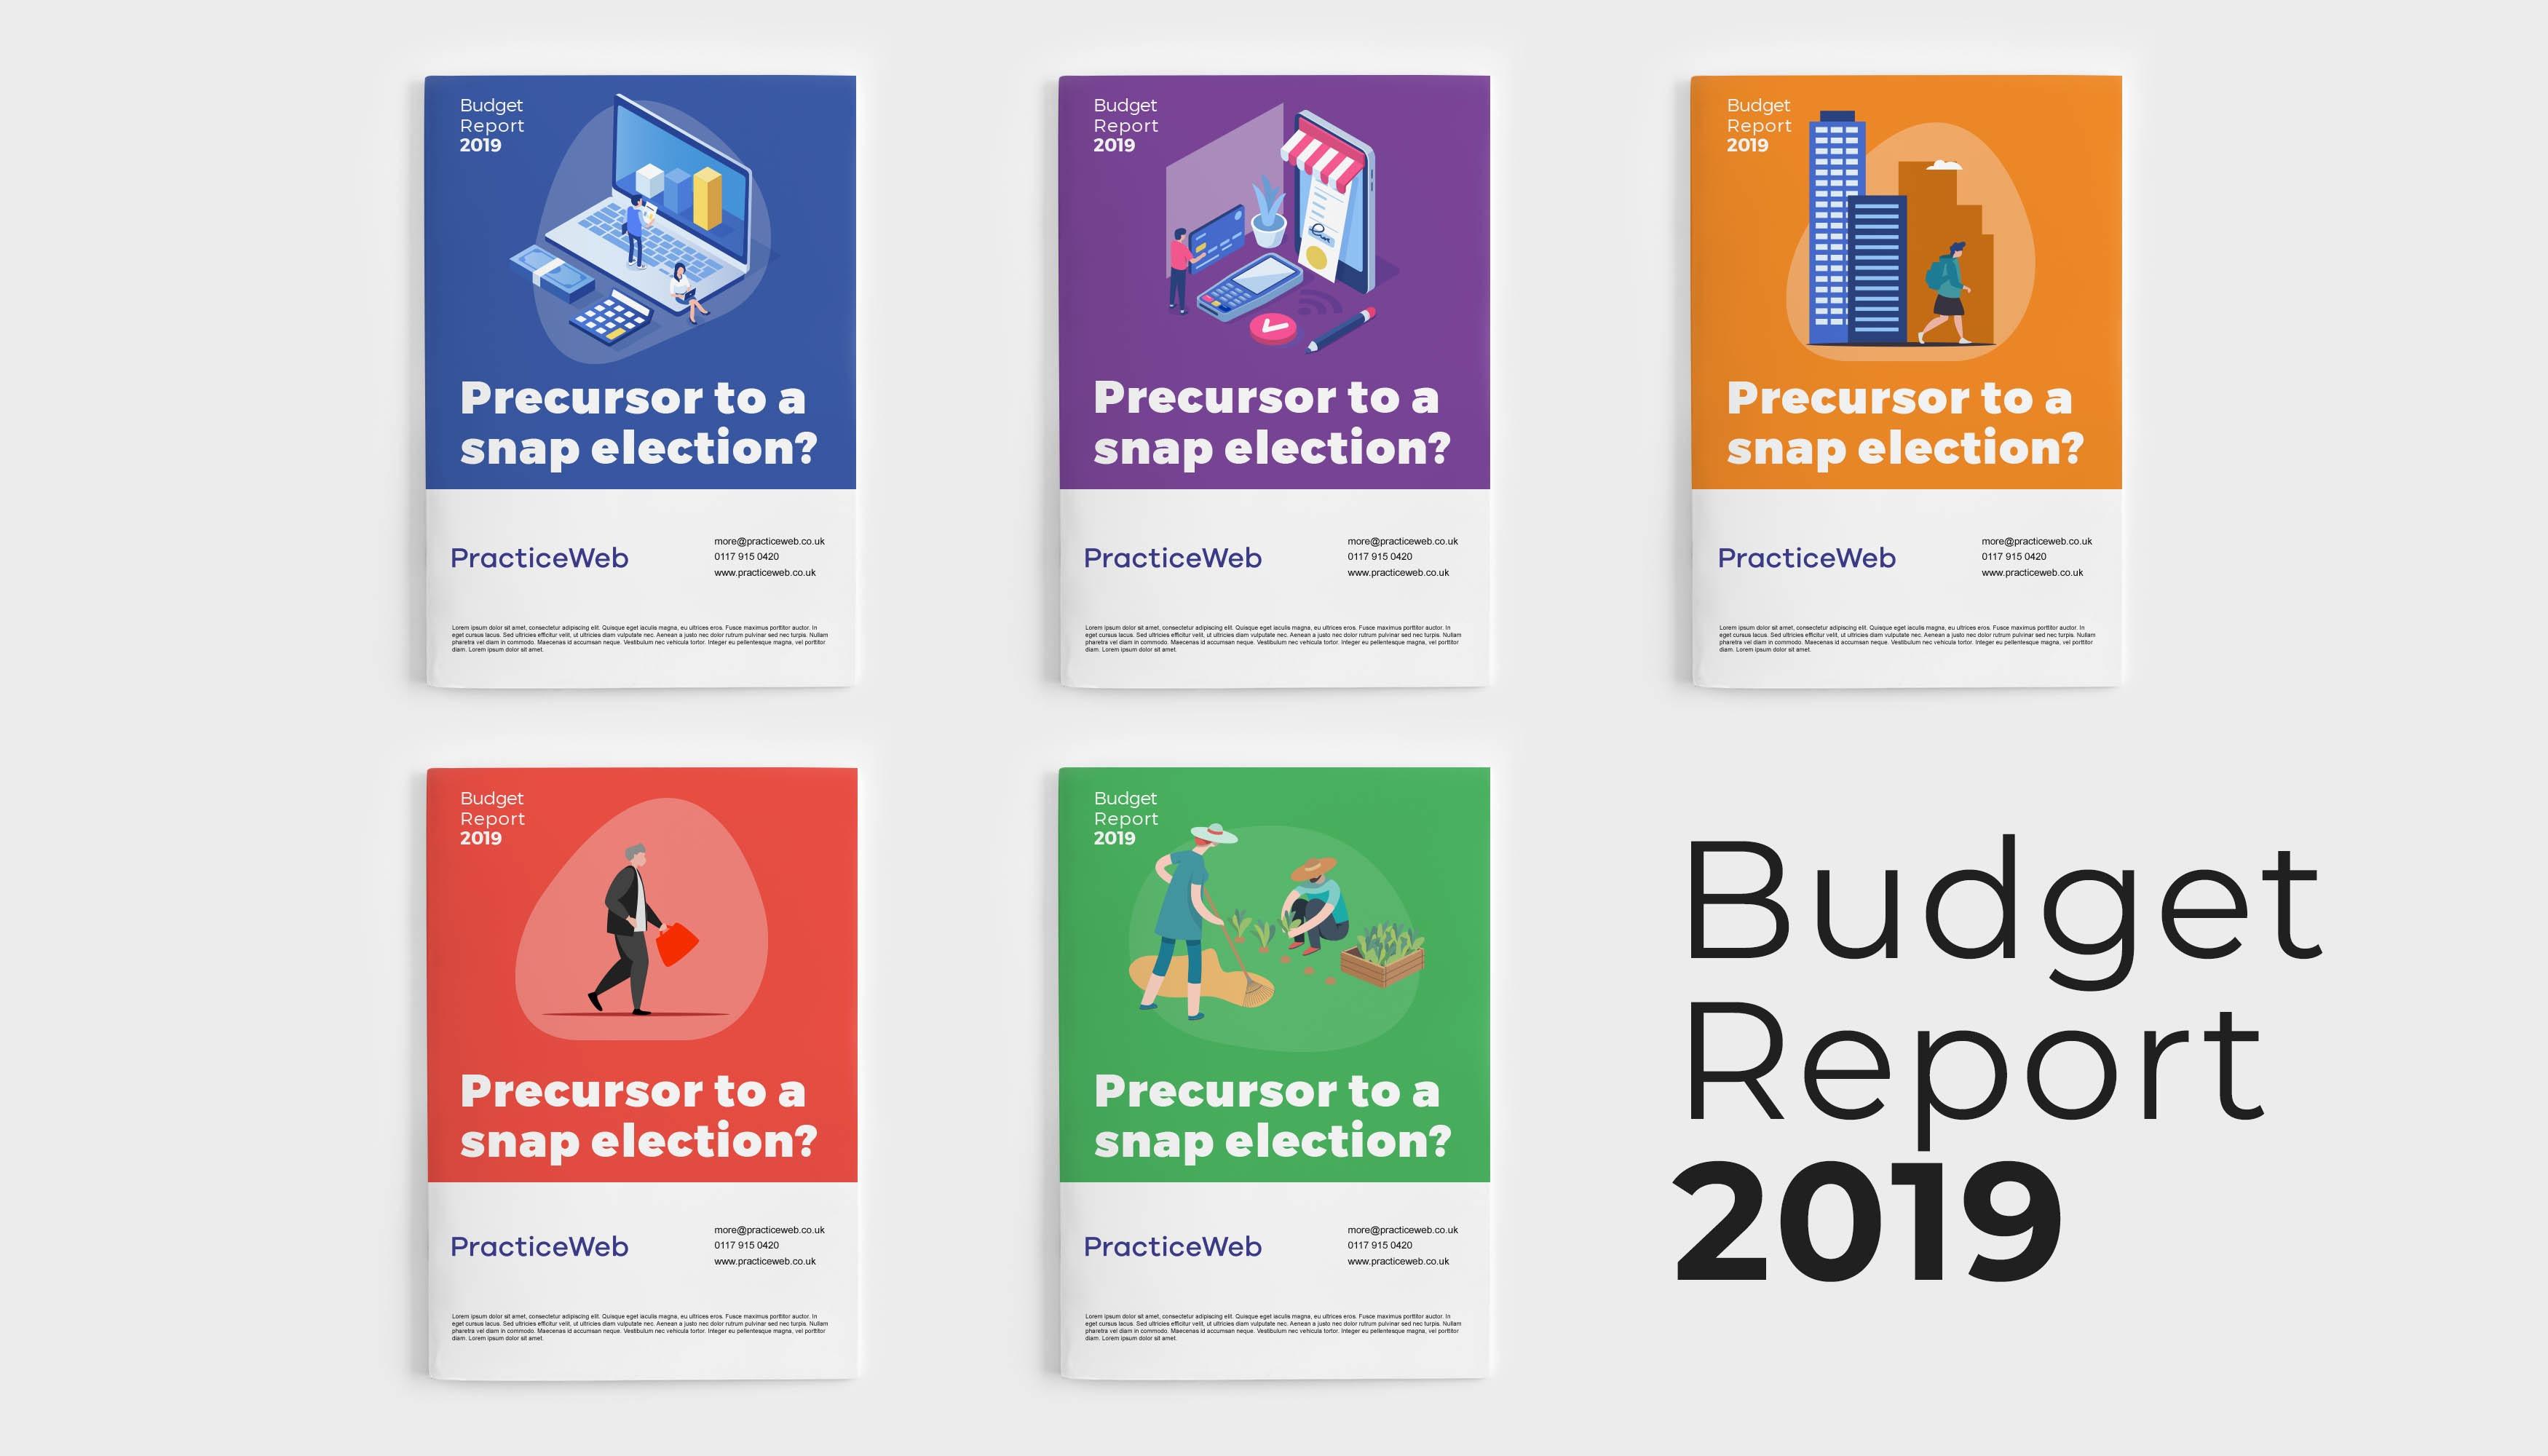 PracticeWeb Budget 2019 covers